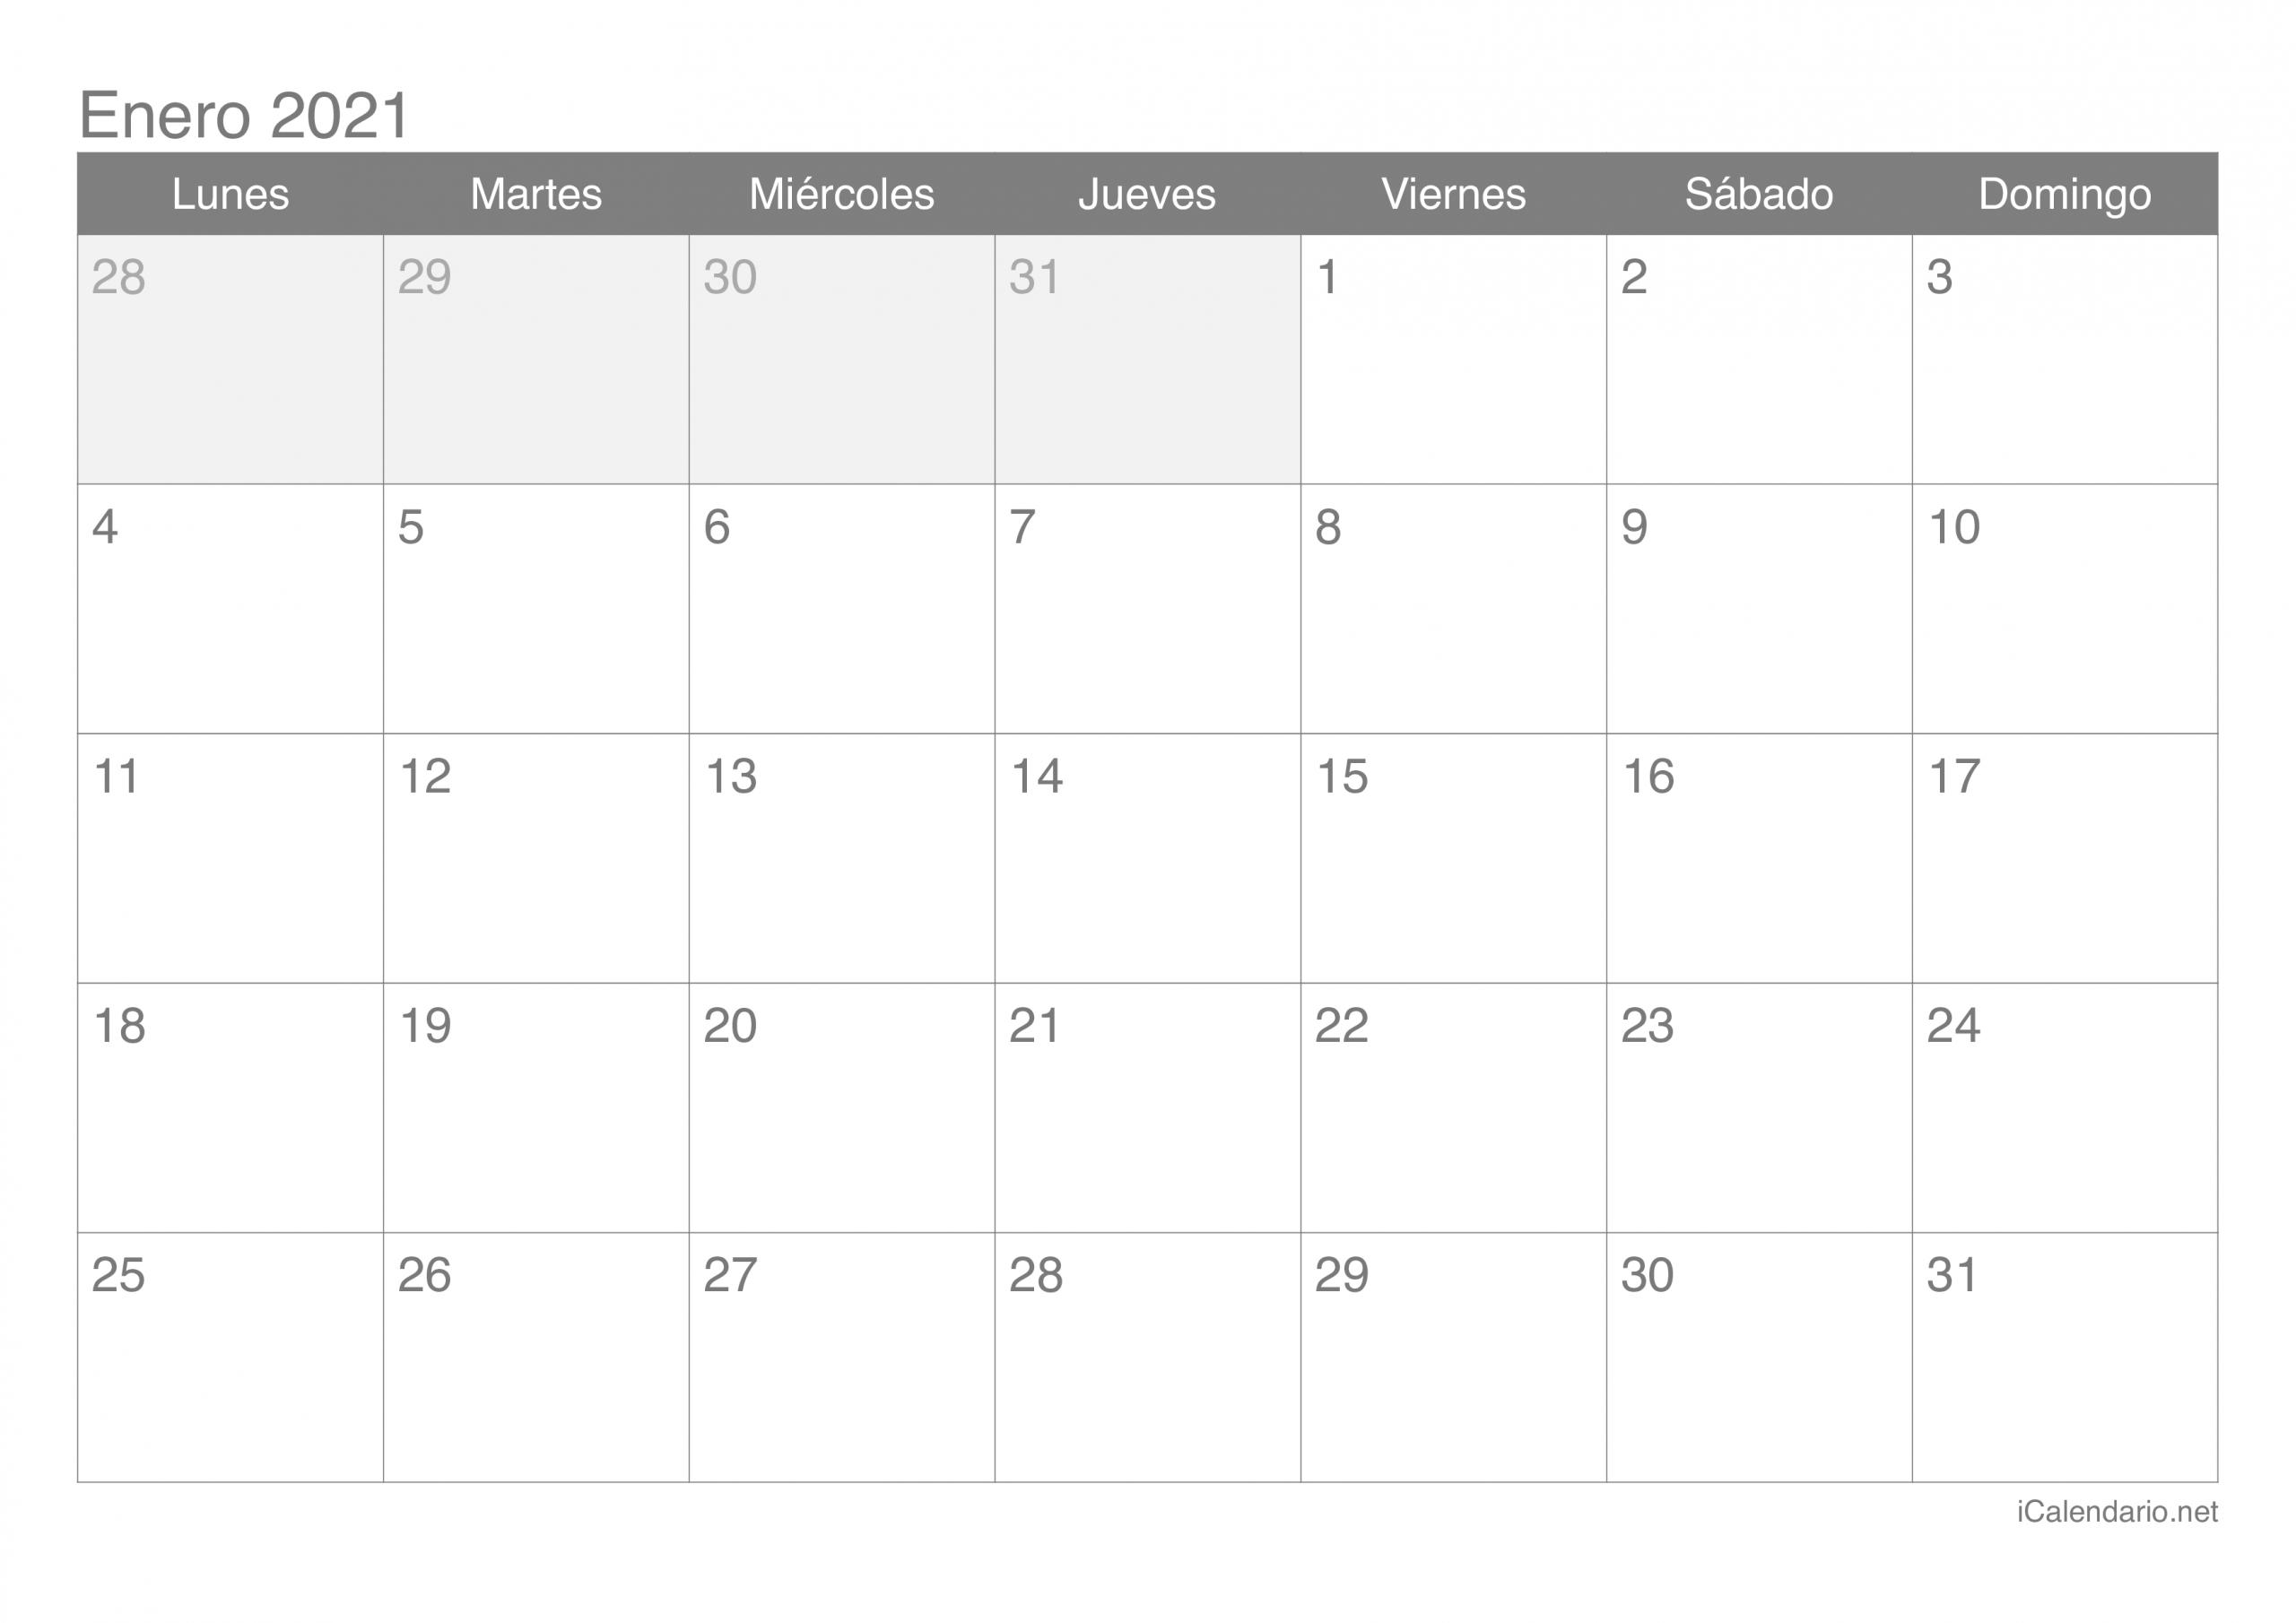 Calendario Enero 2021 Para Imprimir - Icalendario  Calendario Por Mes Para Imprimir 2021